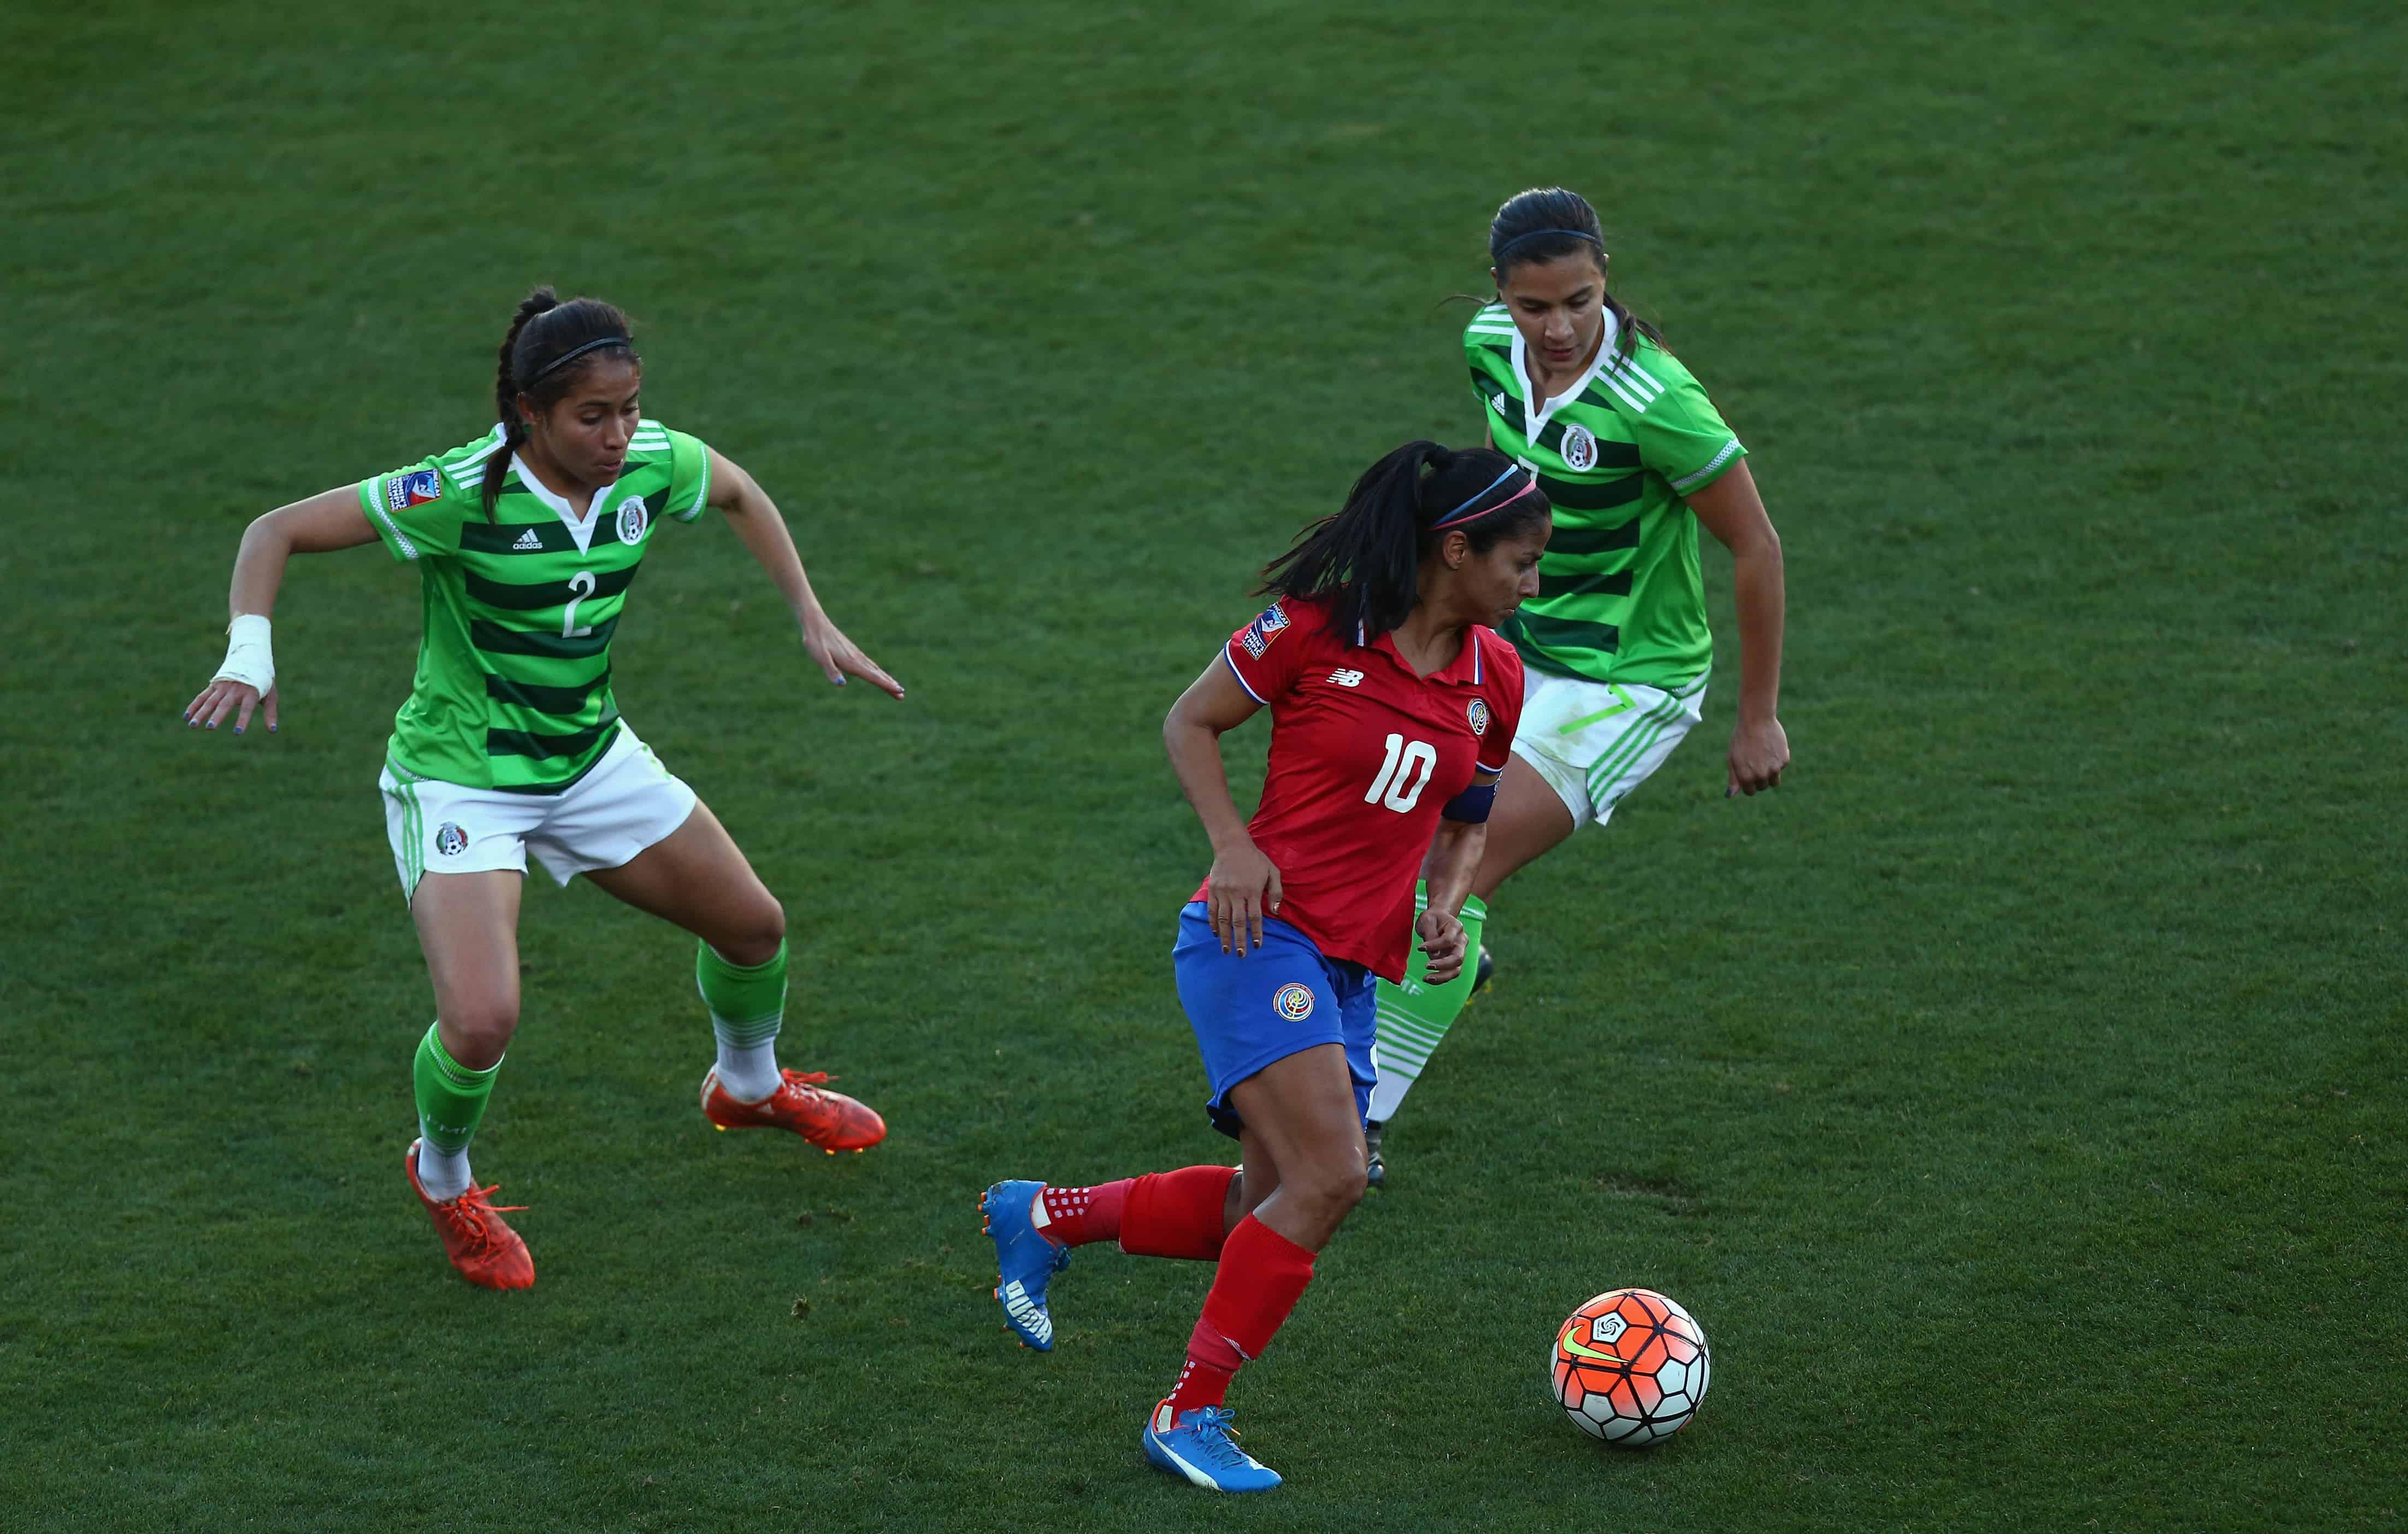 Shirley Cruz, Costa Rica women's soccer